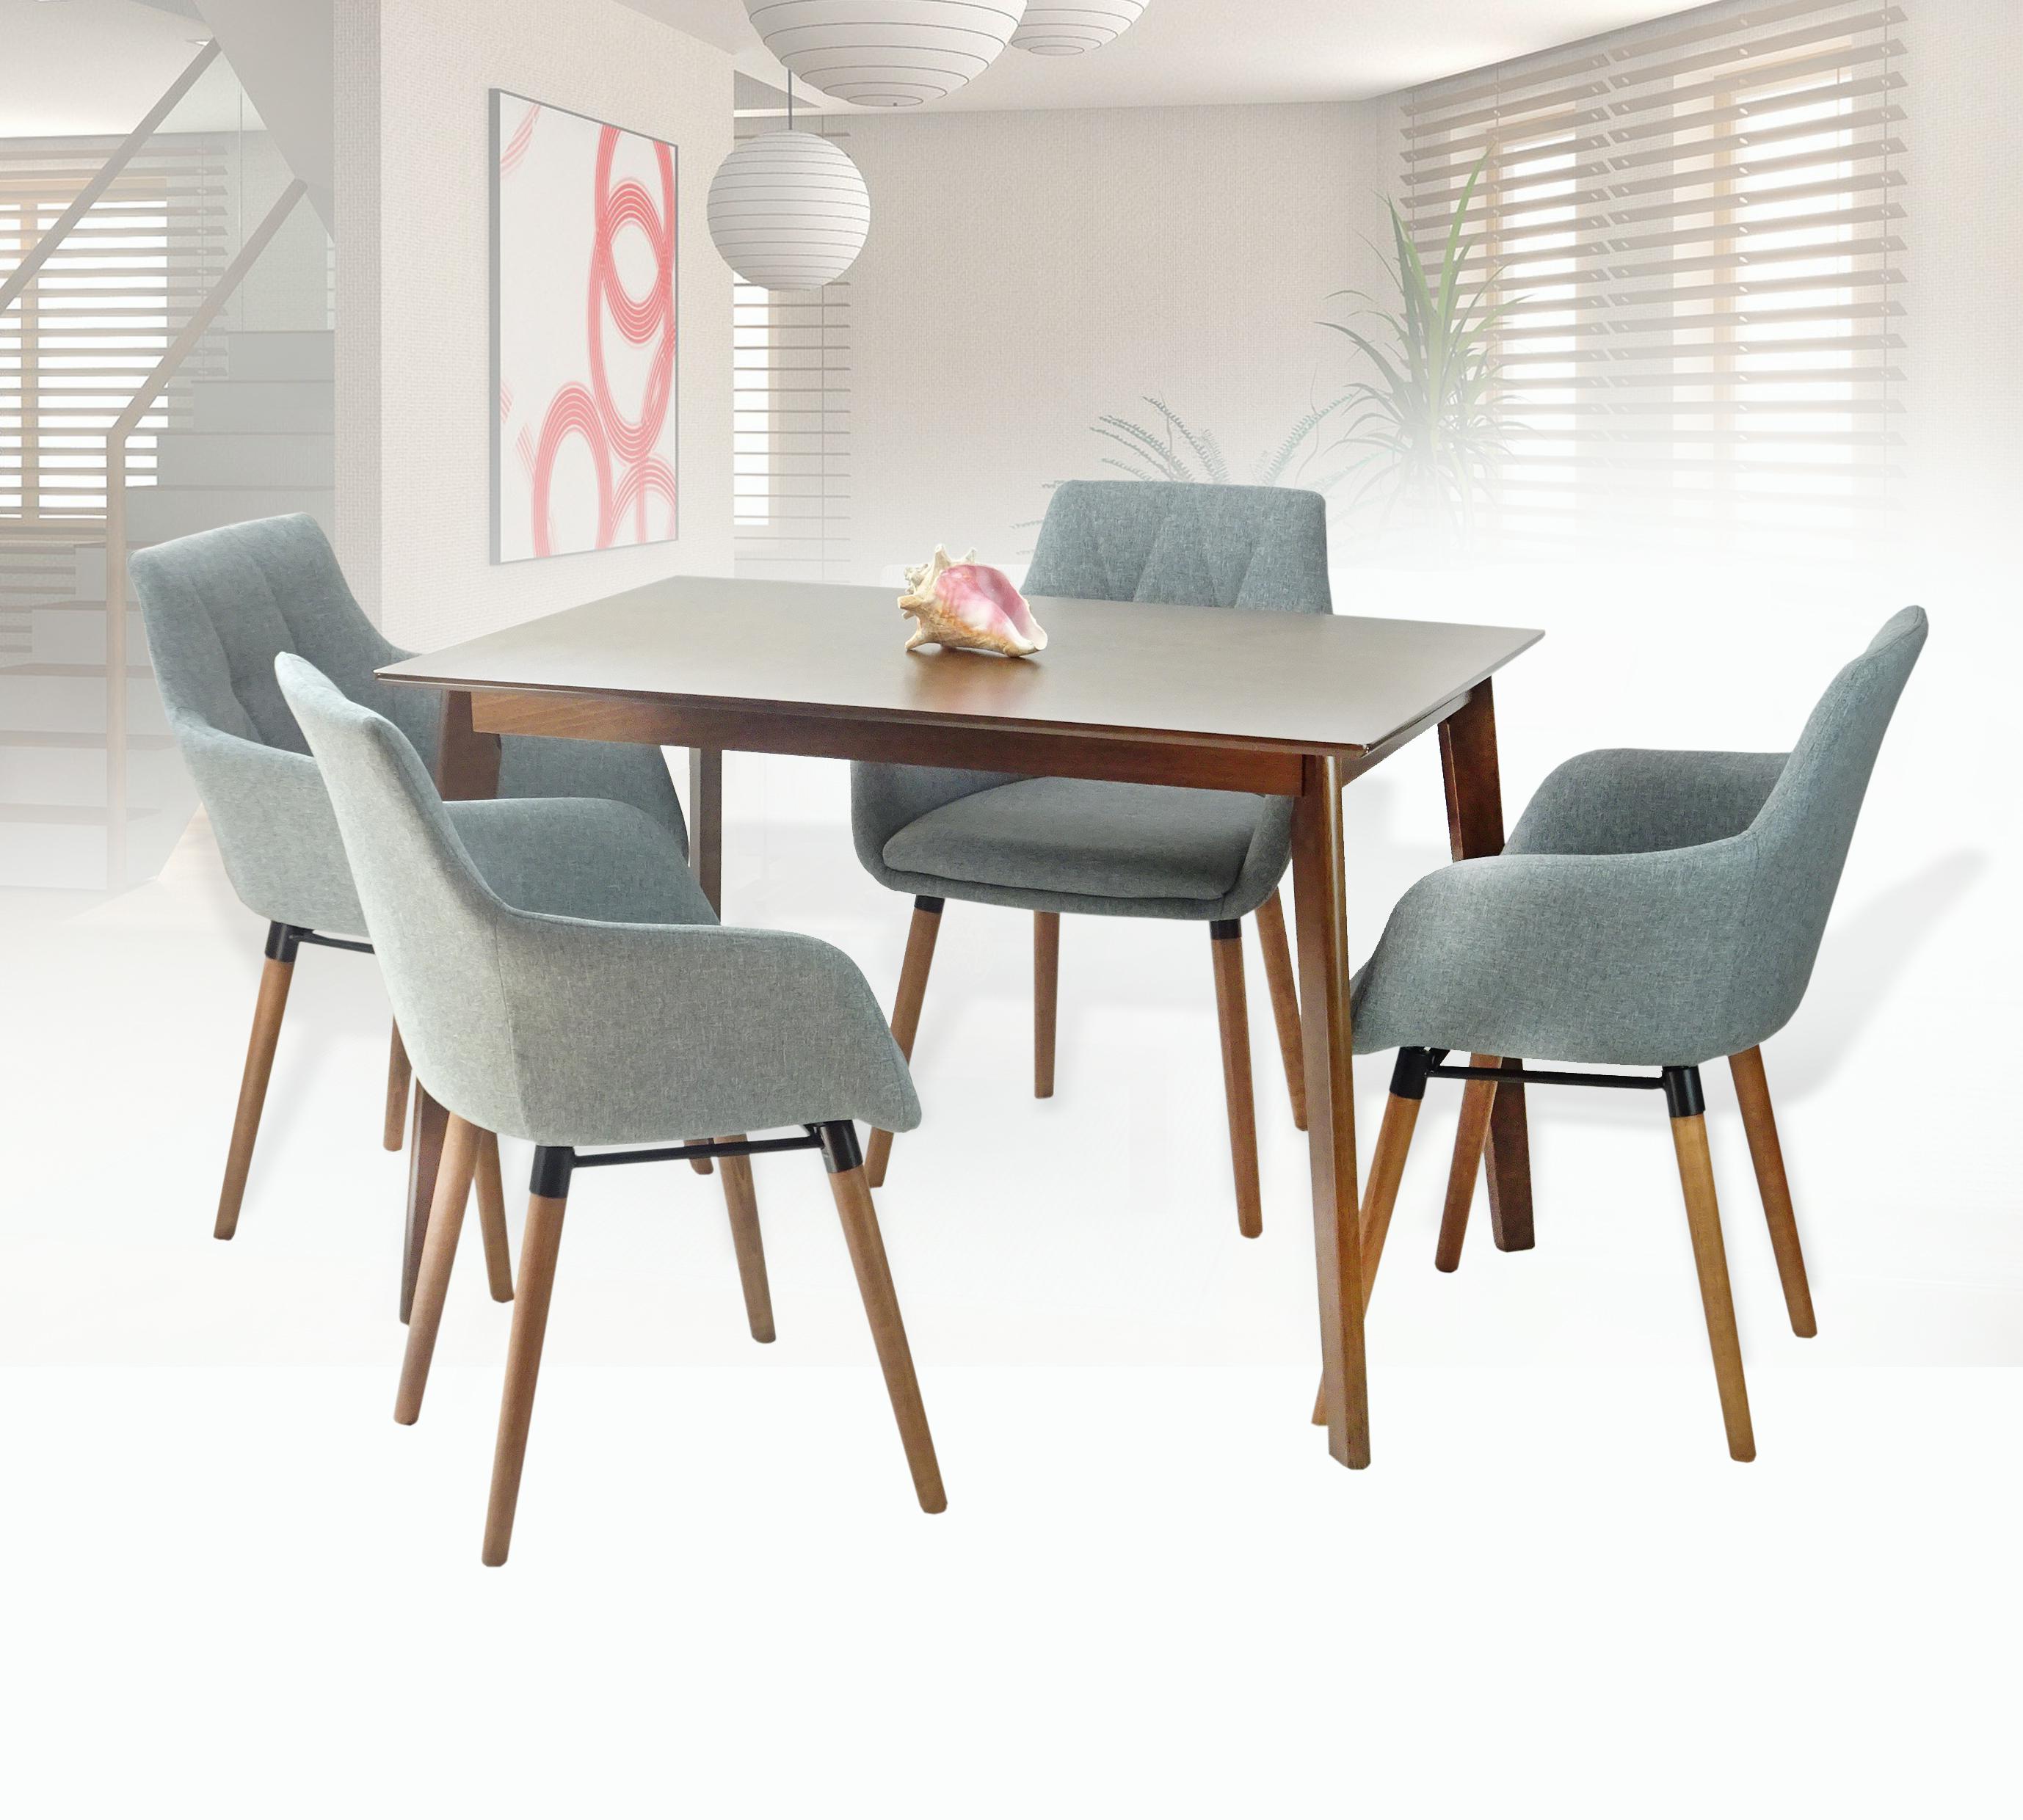 Buy Dining Kitchen Modern Alba Armchairs Set Of 4 Wood